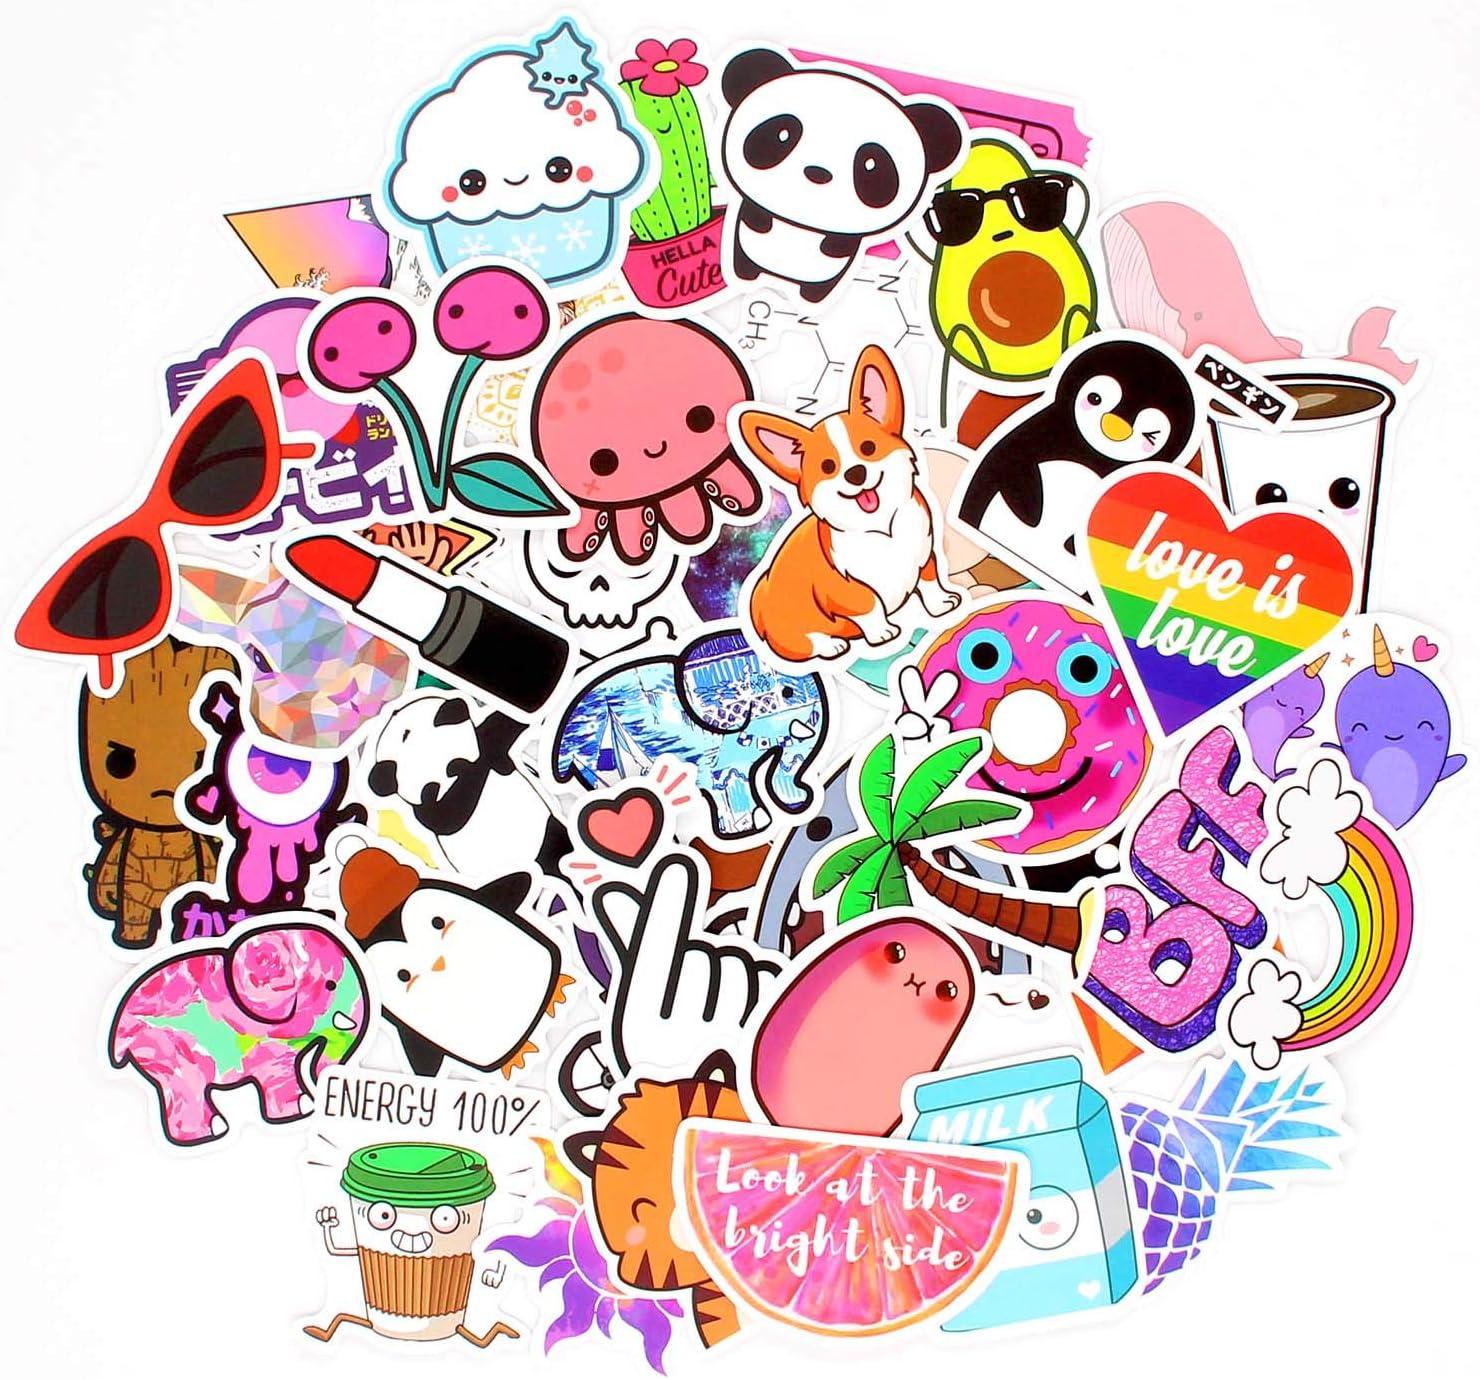 HUIZHE Kawaii Stickers for Kids, 50 Pcs Vinyl Waterproof Cool Stickers Decal for Hydroflask, Laptops, Folders, Refrigerators, Walls, Windows, Girls (Vsco)